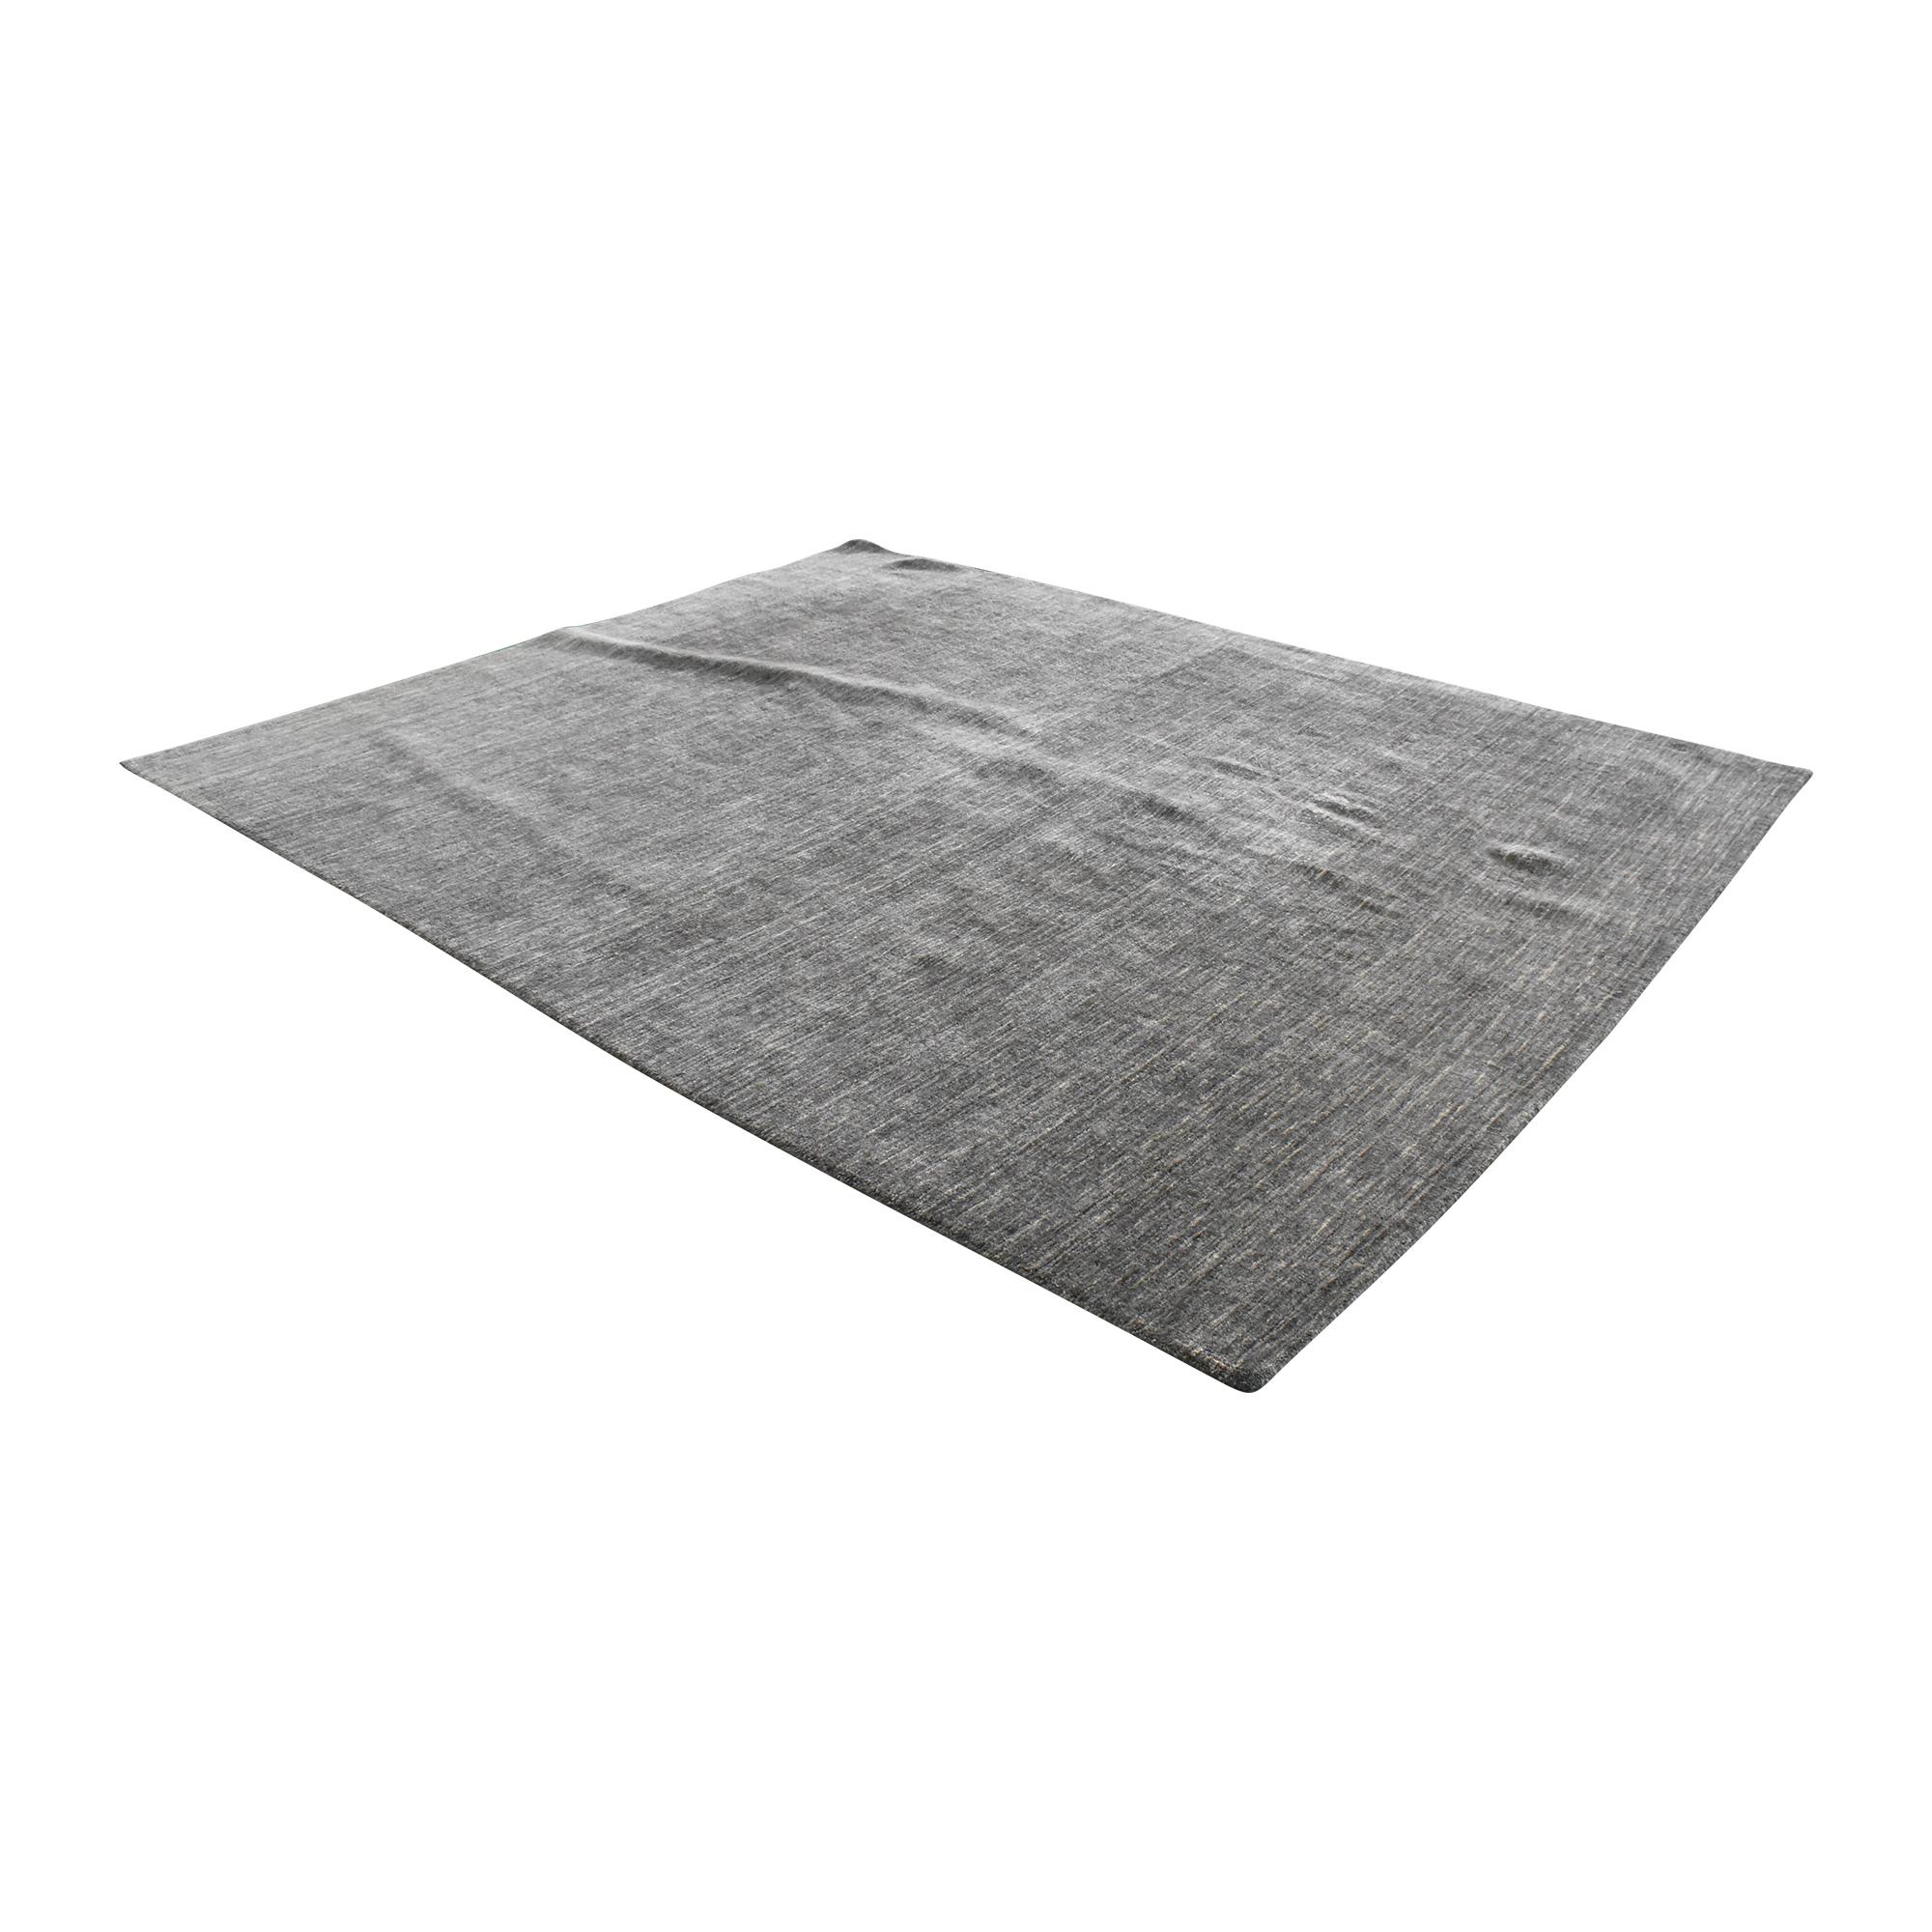 Safavieh Safavieh Mirage Alearda Area Rug gray